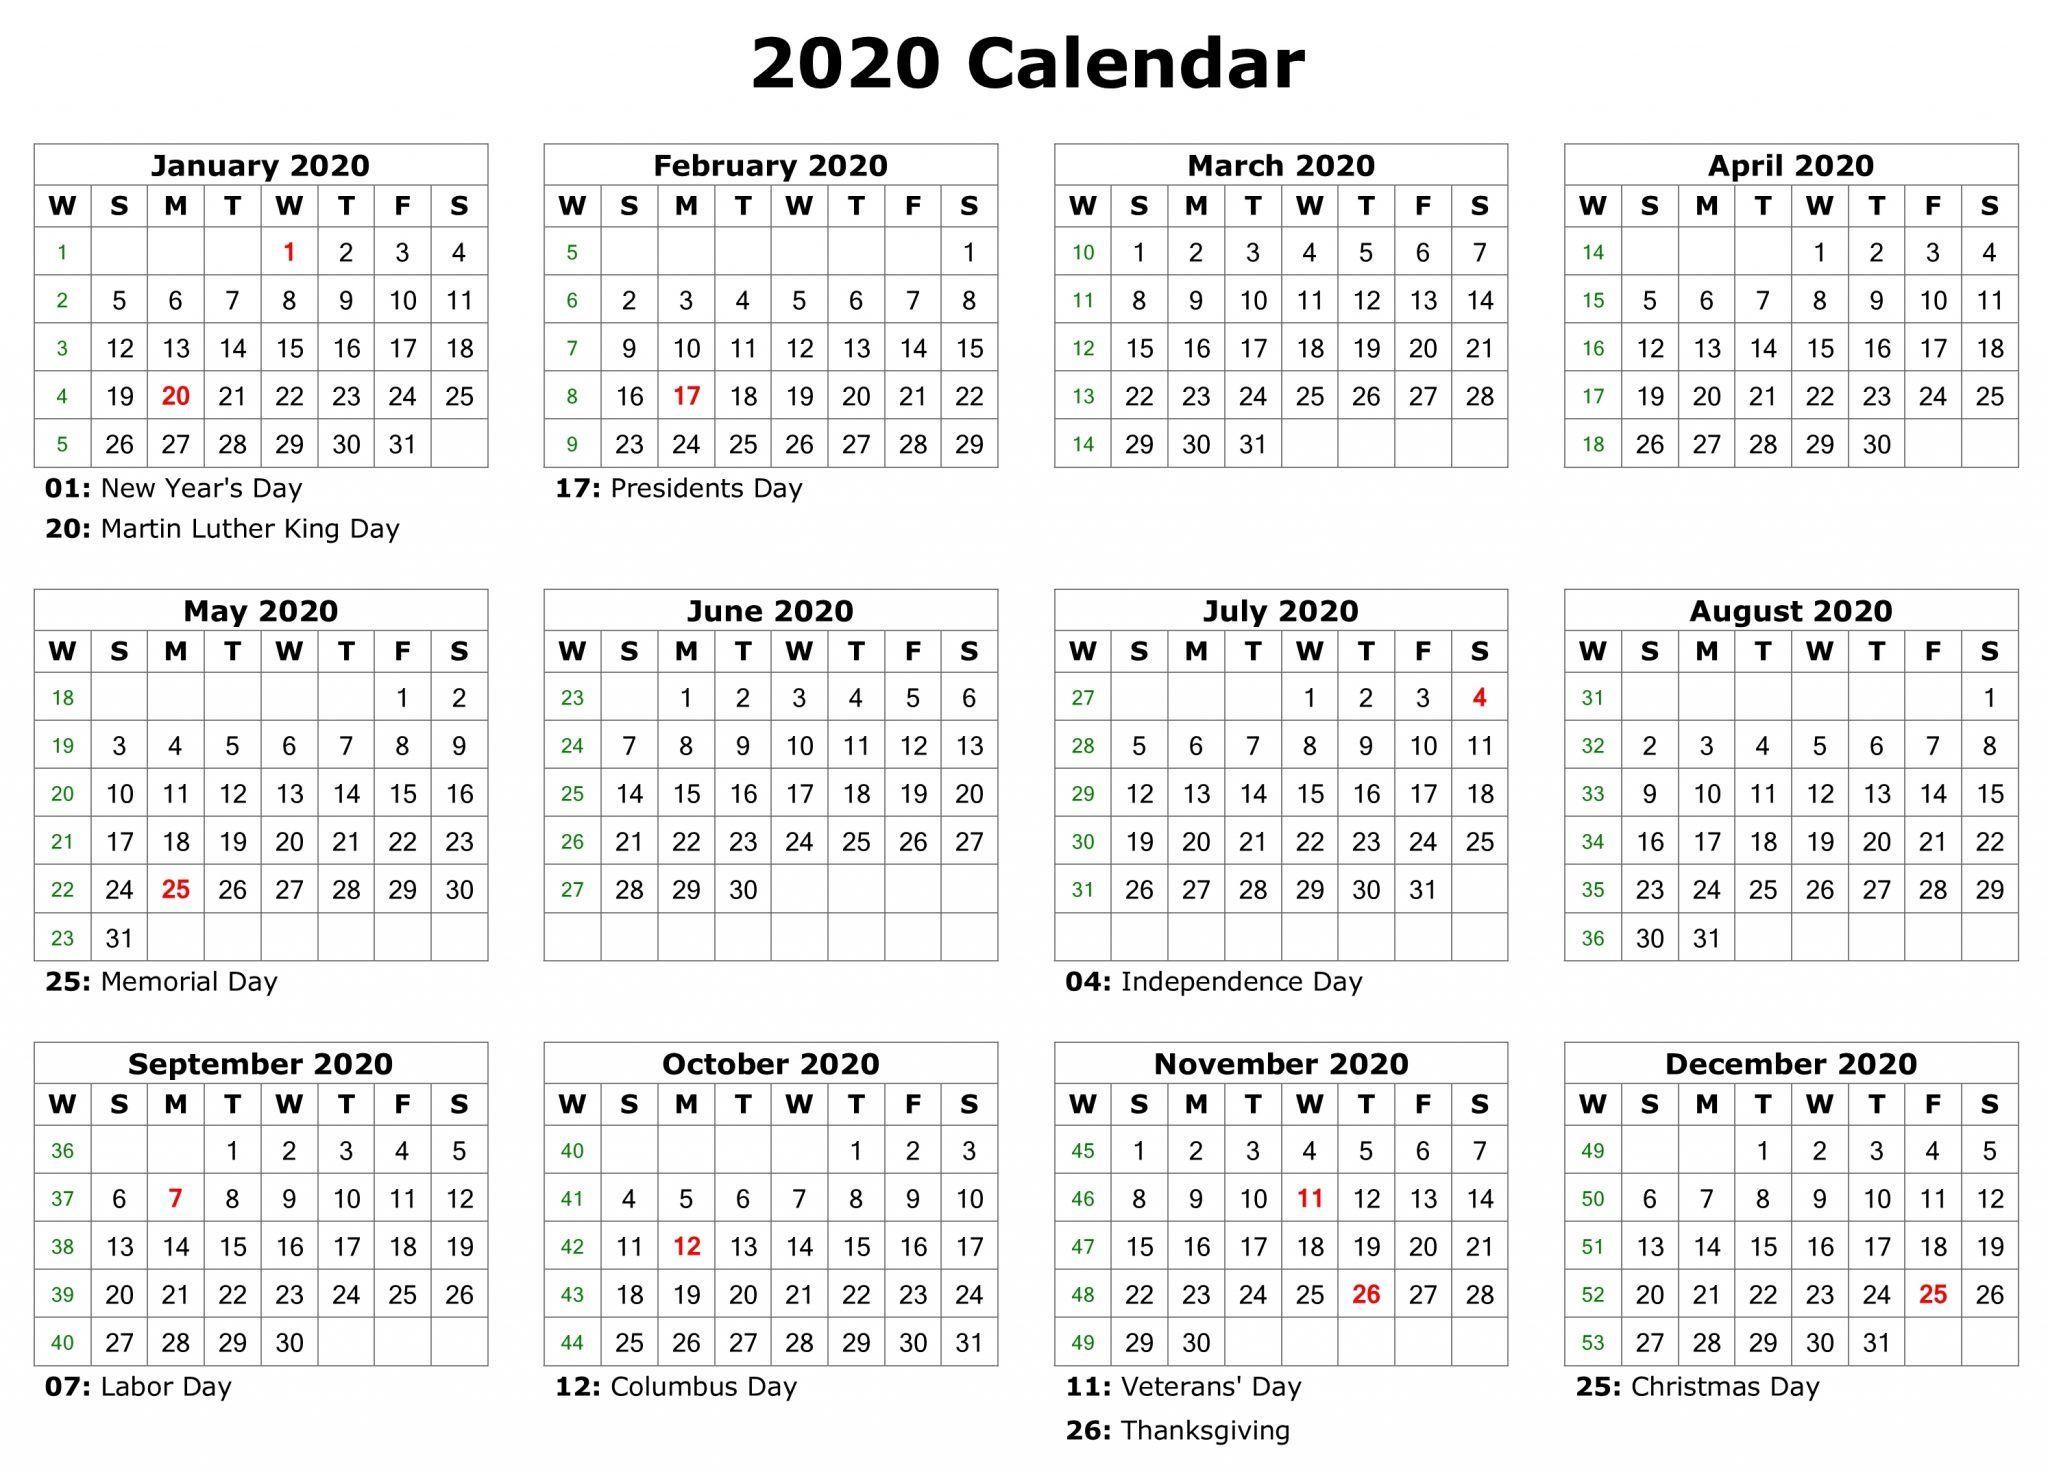 Free Editable Calendar 2020 Printable Templates   Calendar  Free Editable Calendar Templates Printable